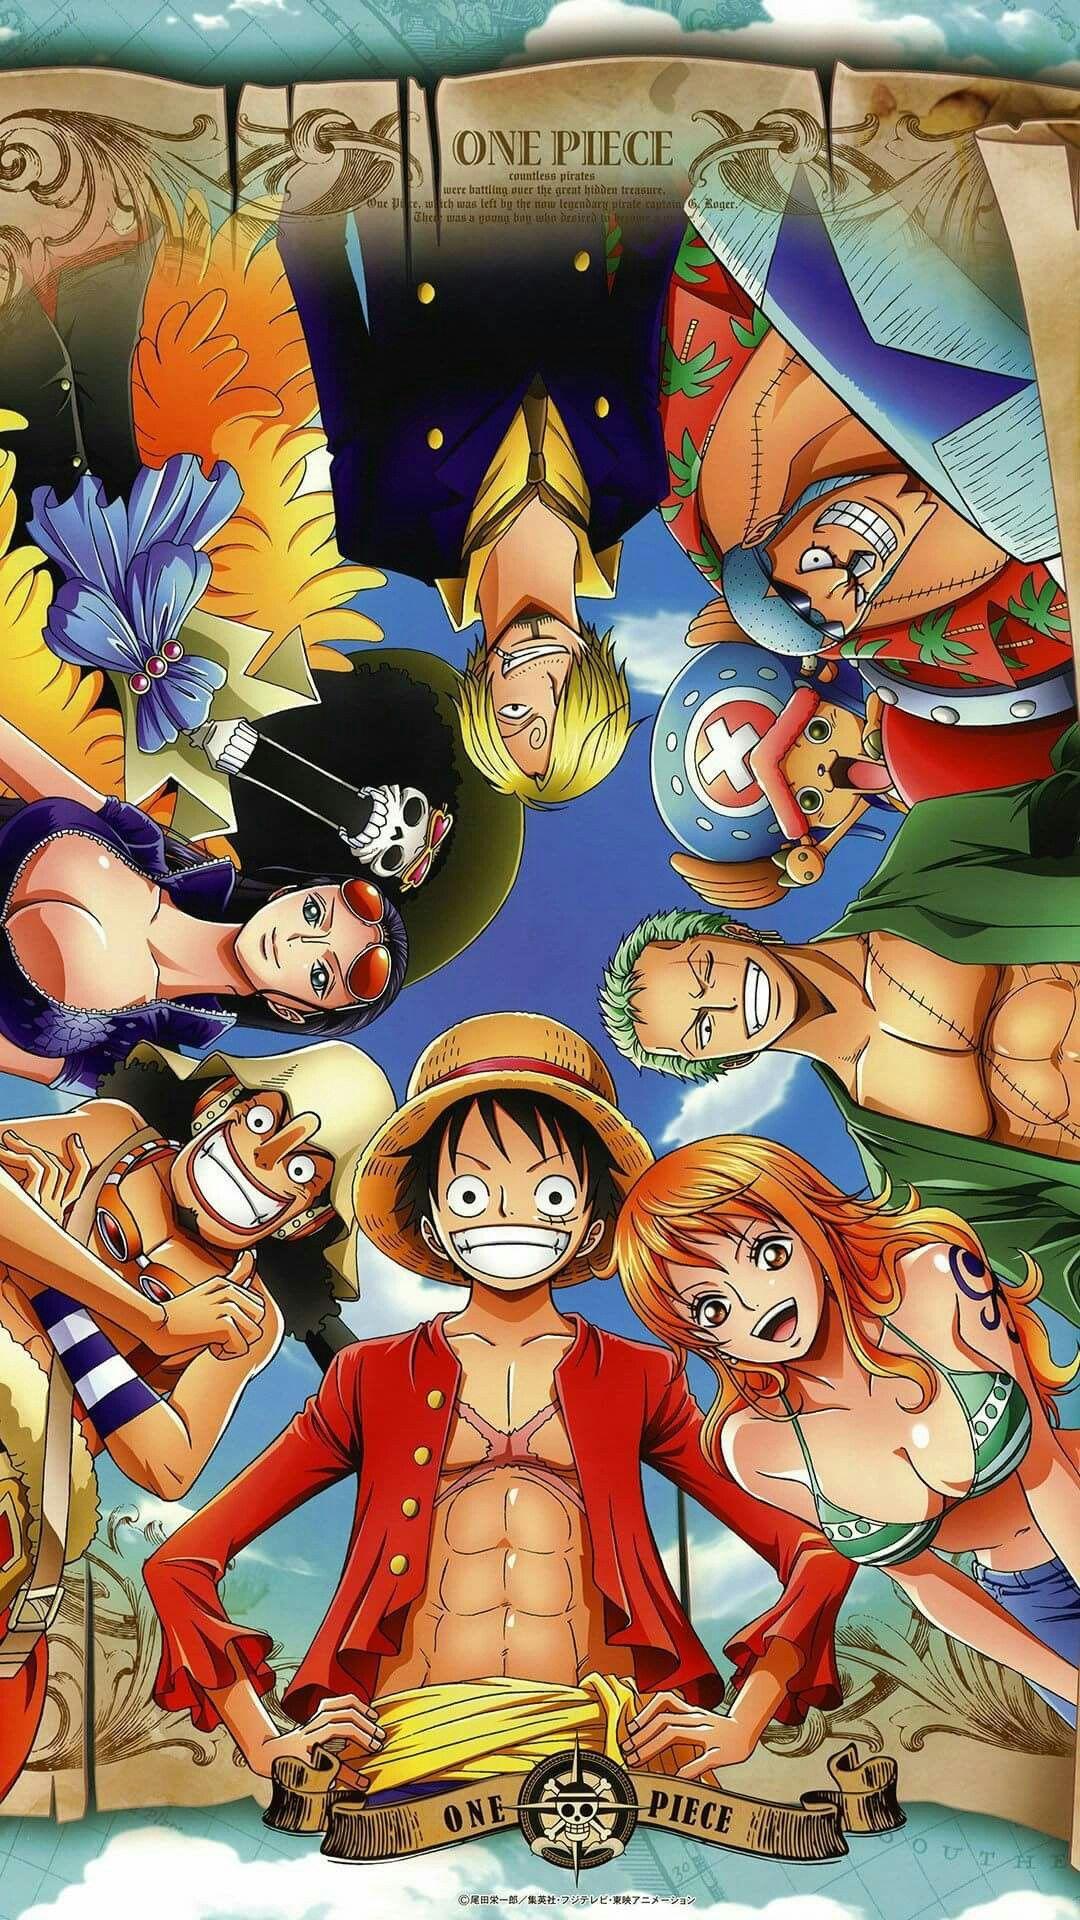 Pin by 海賊王 on One Piece *^O^* Anime, One piece